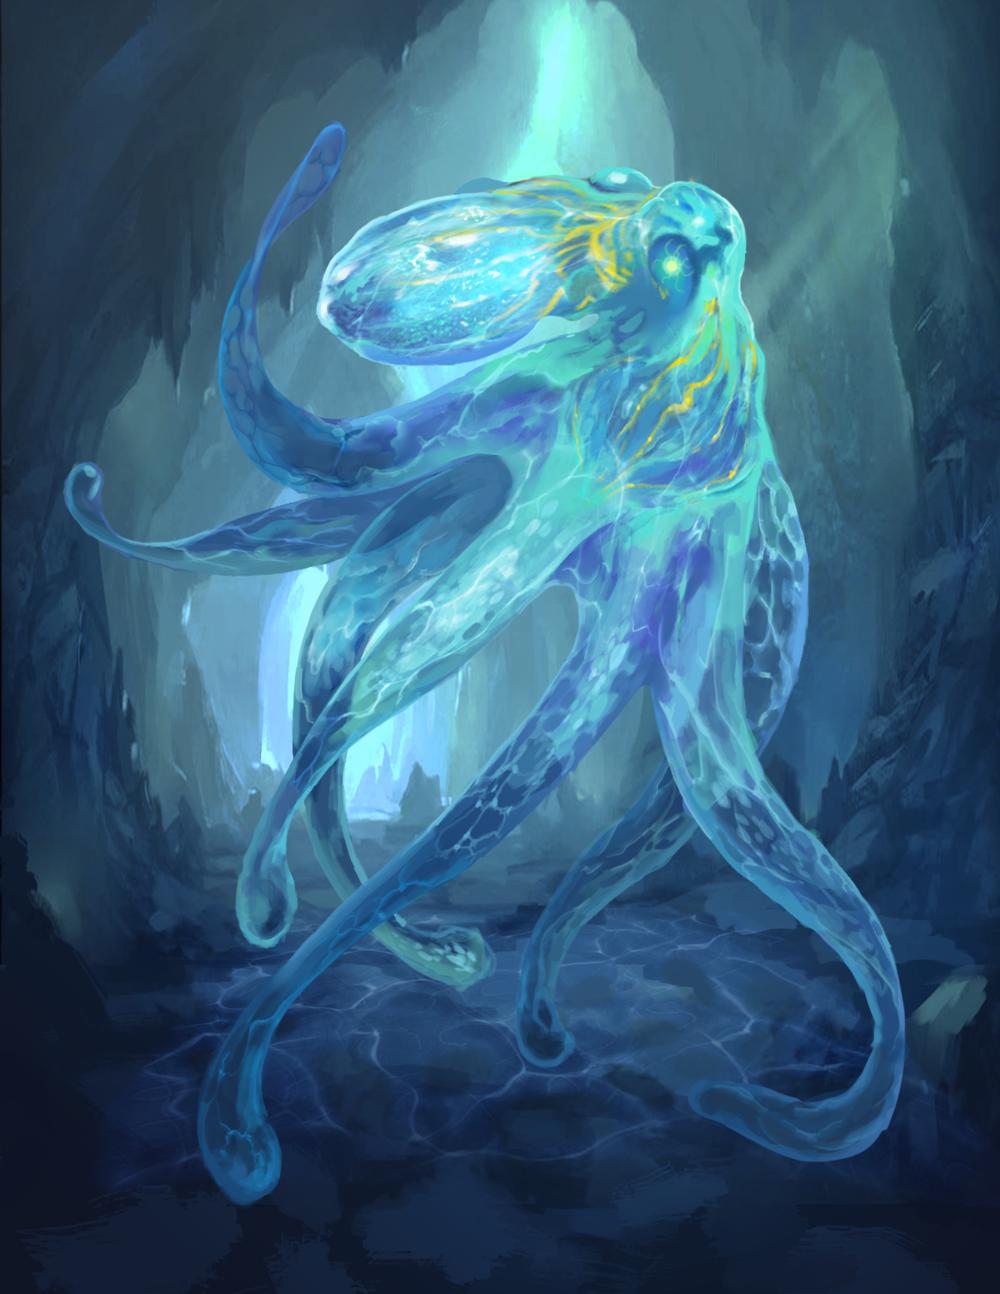 water_elemental_-_Huy_Mai_Van.png